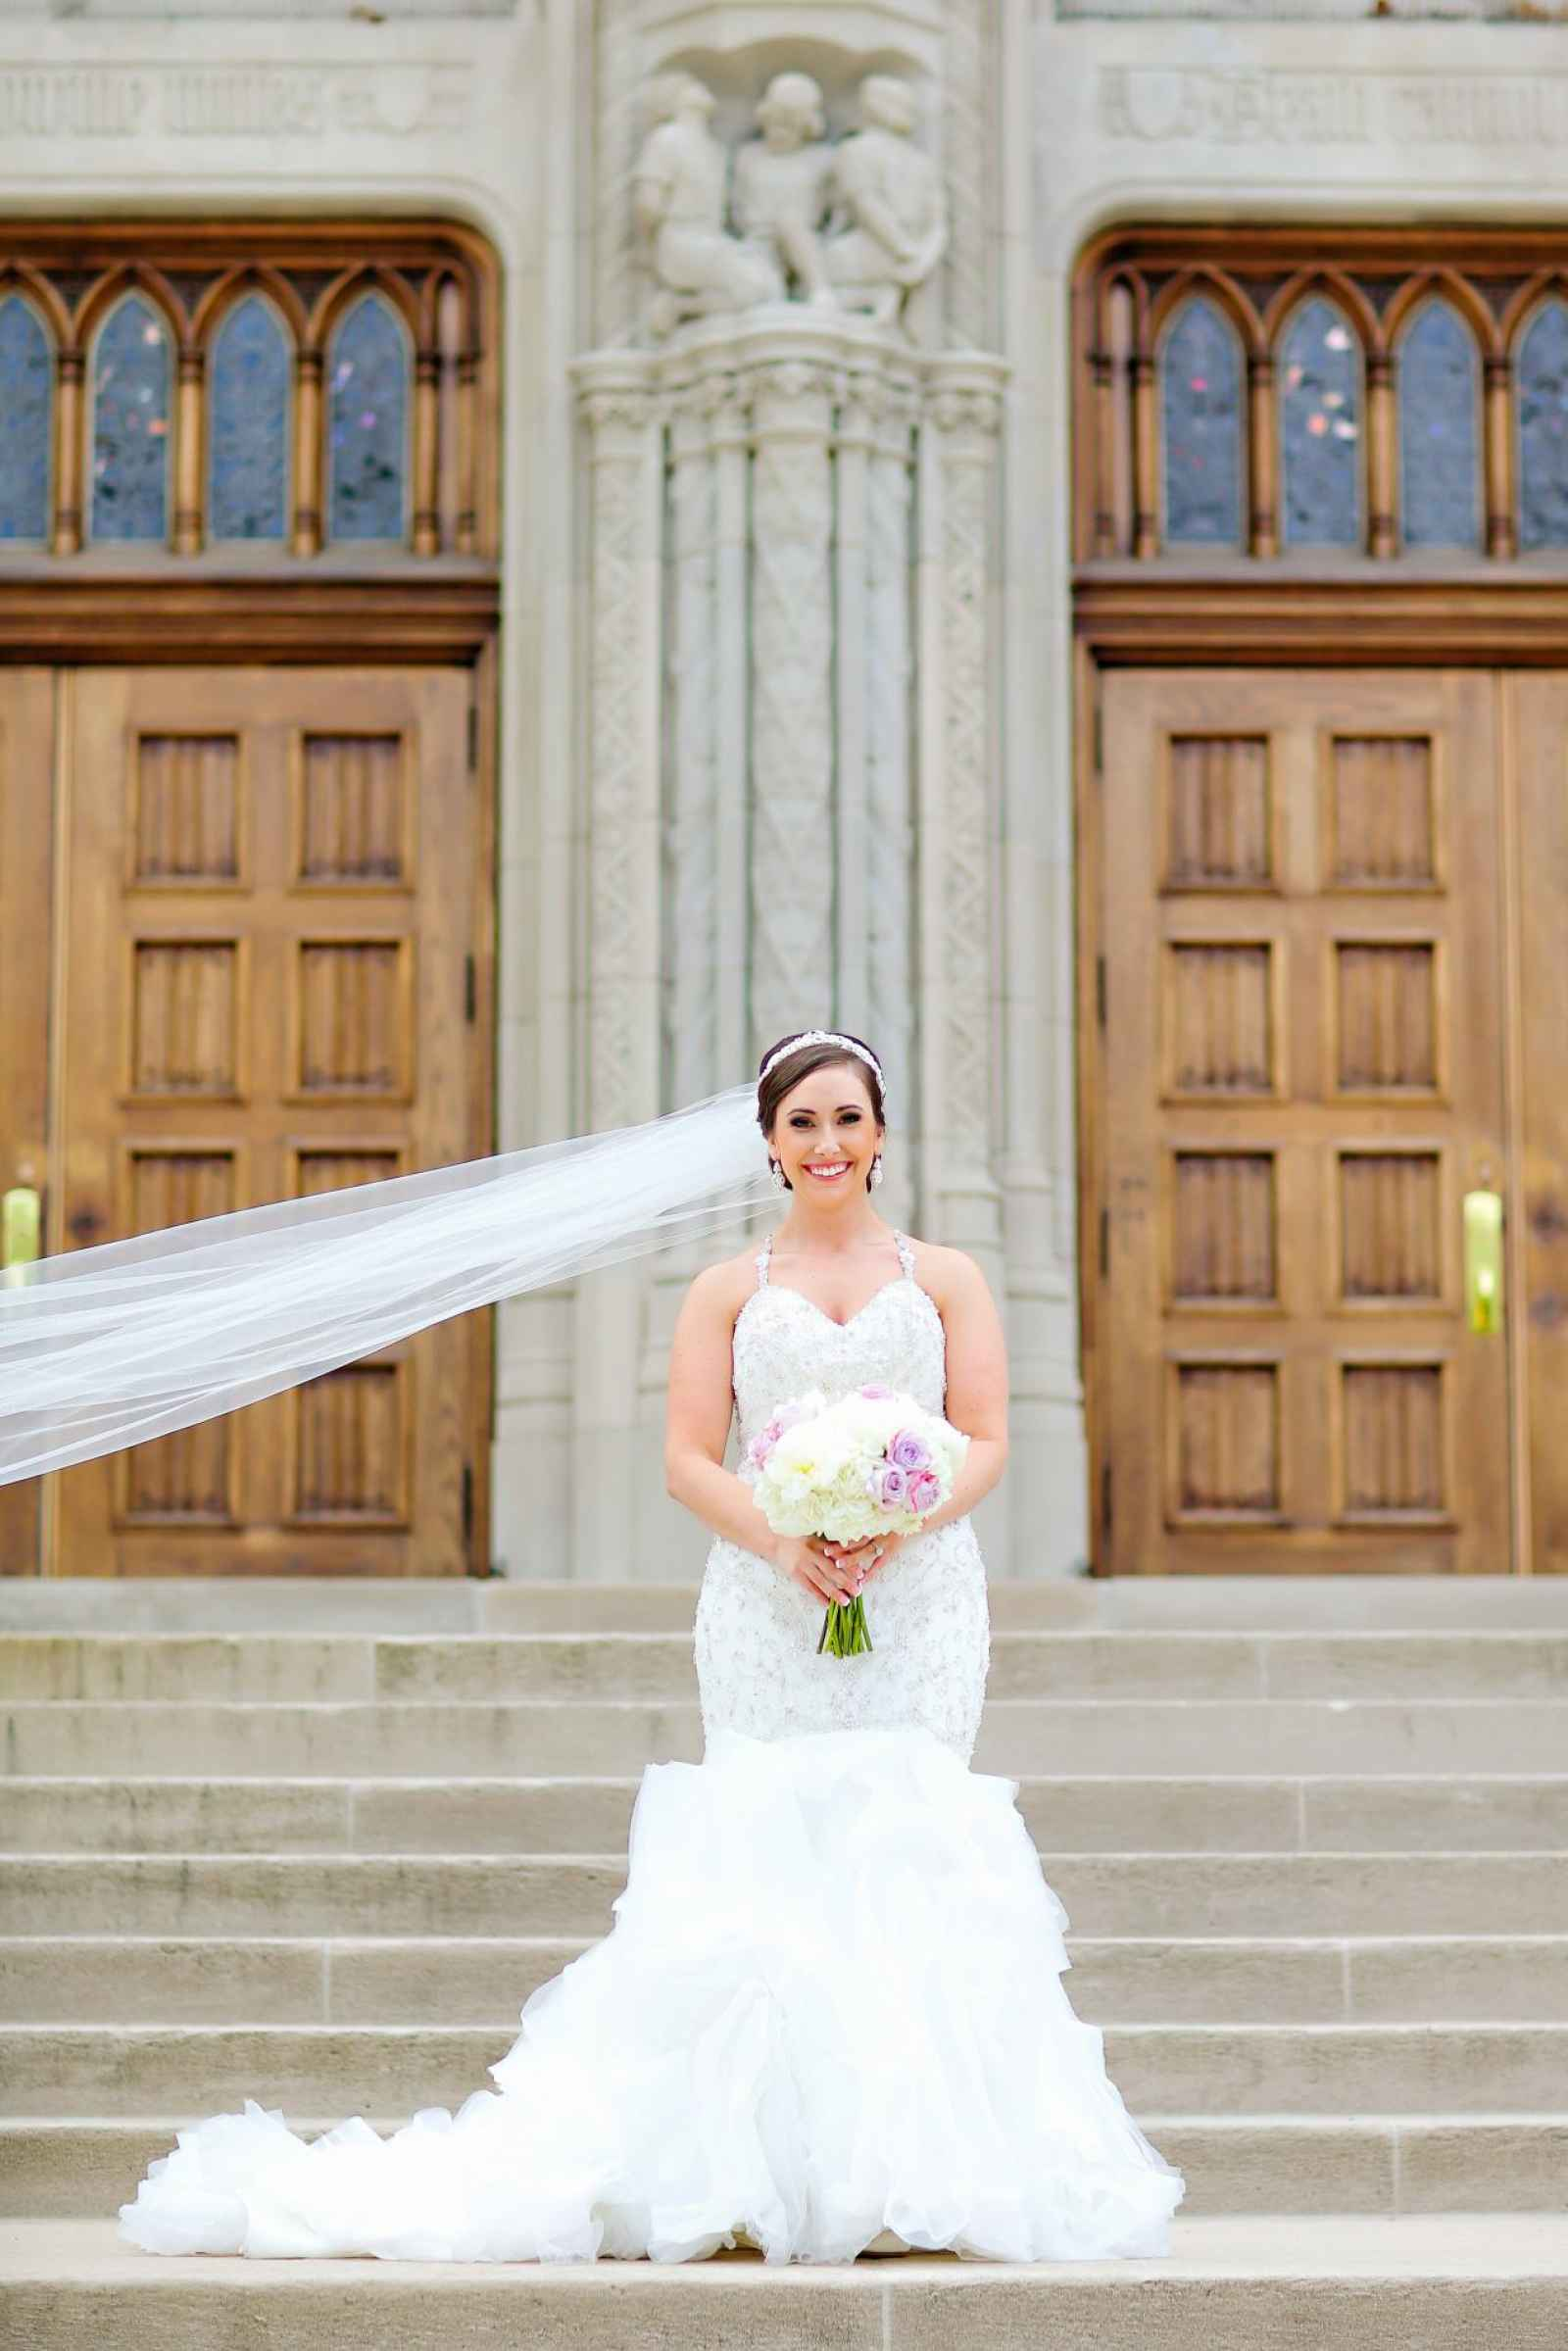 Who Designed Megan S Wedding Dress.The Wedding Story Of Megan And Evan Hyer Weddingday Magazine